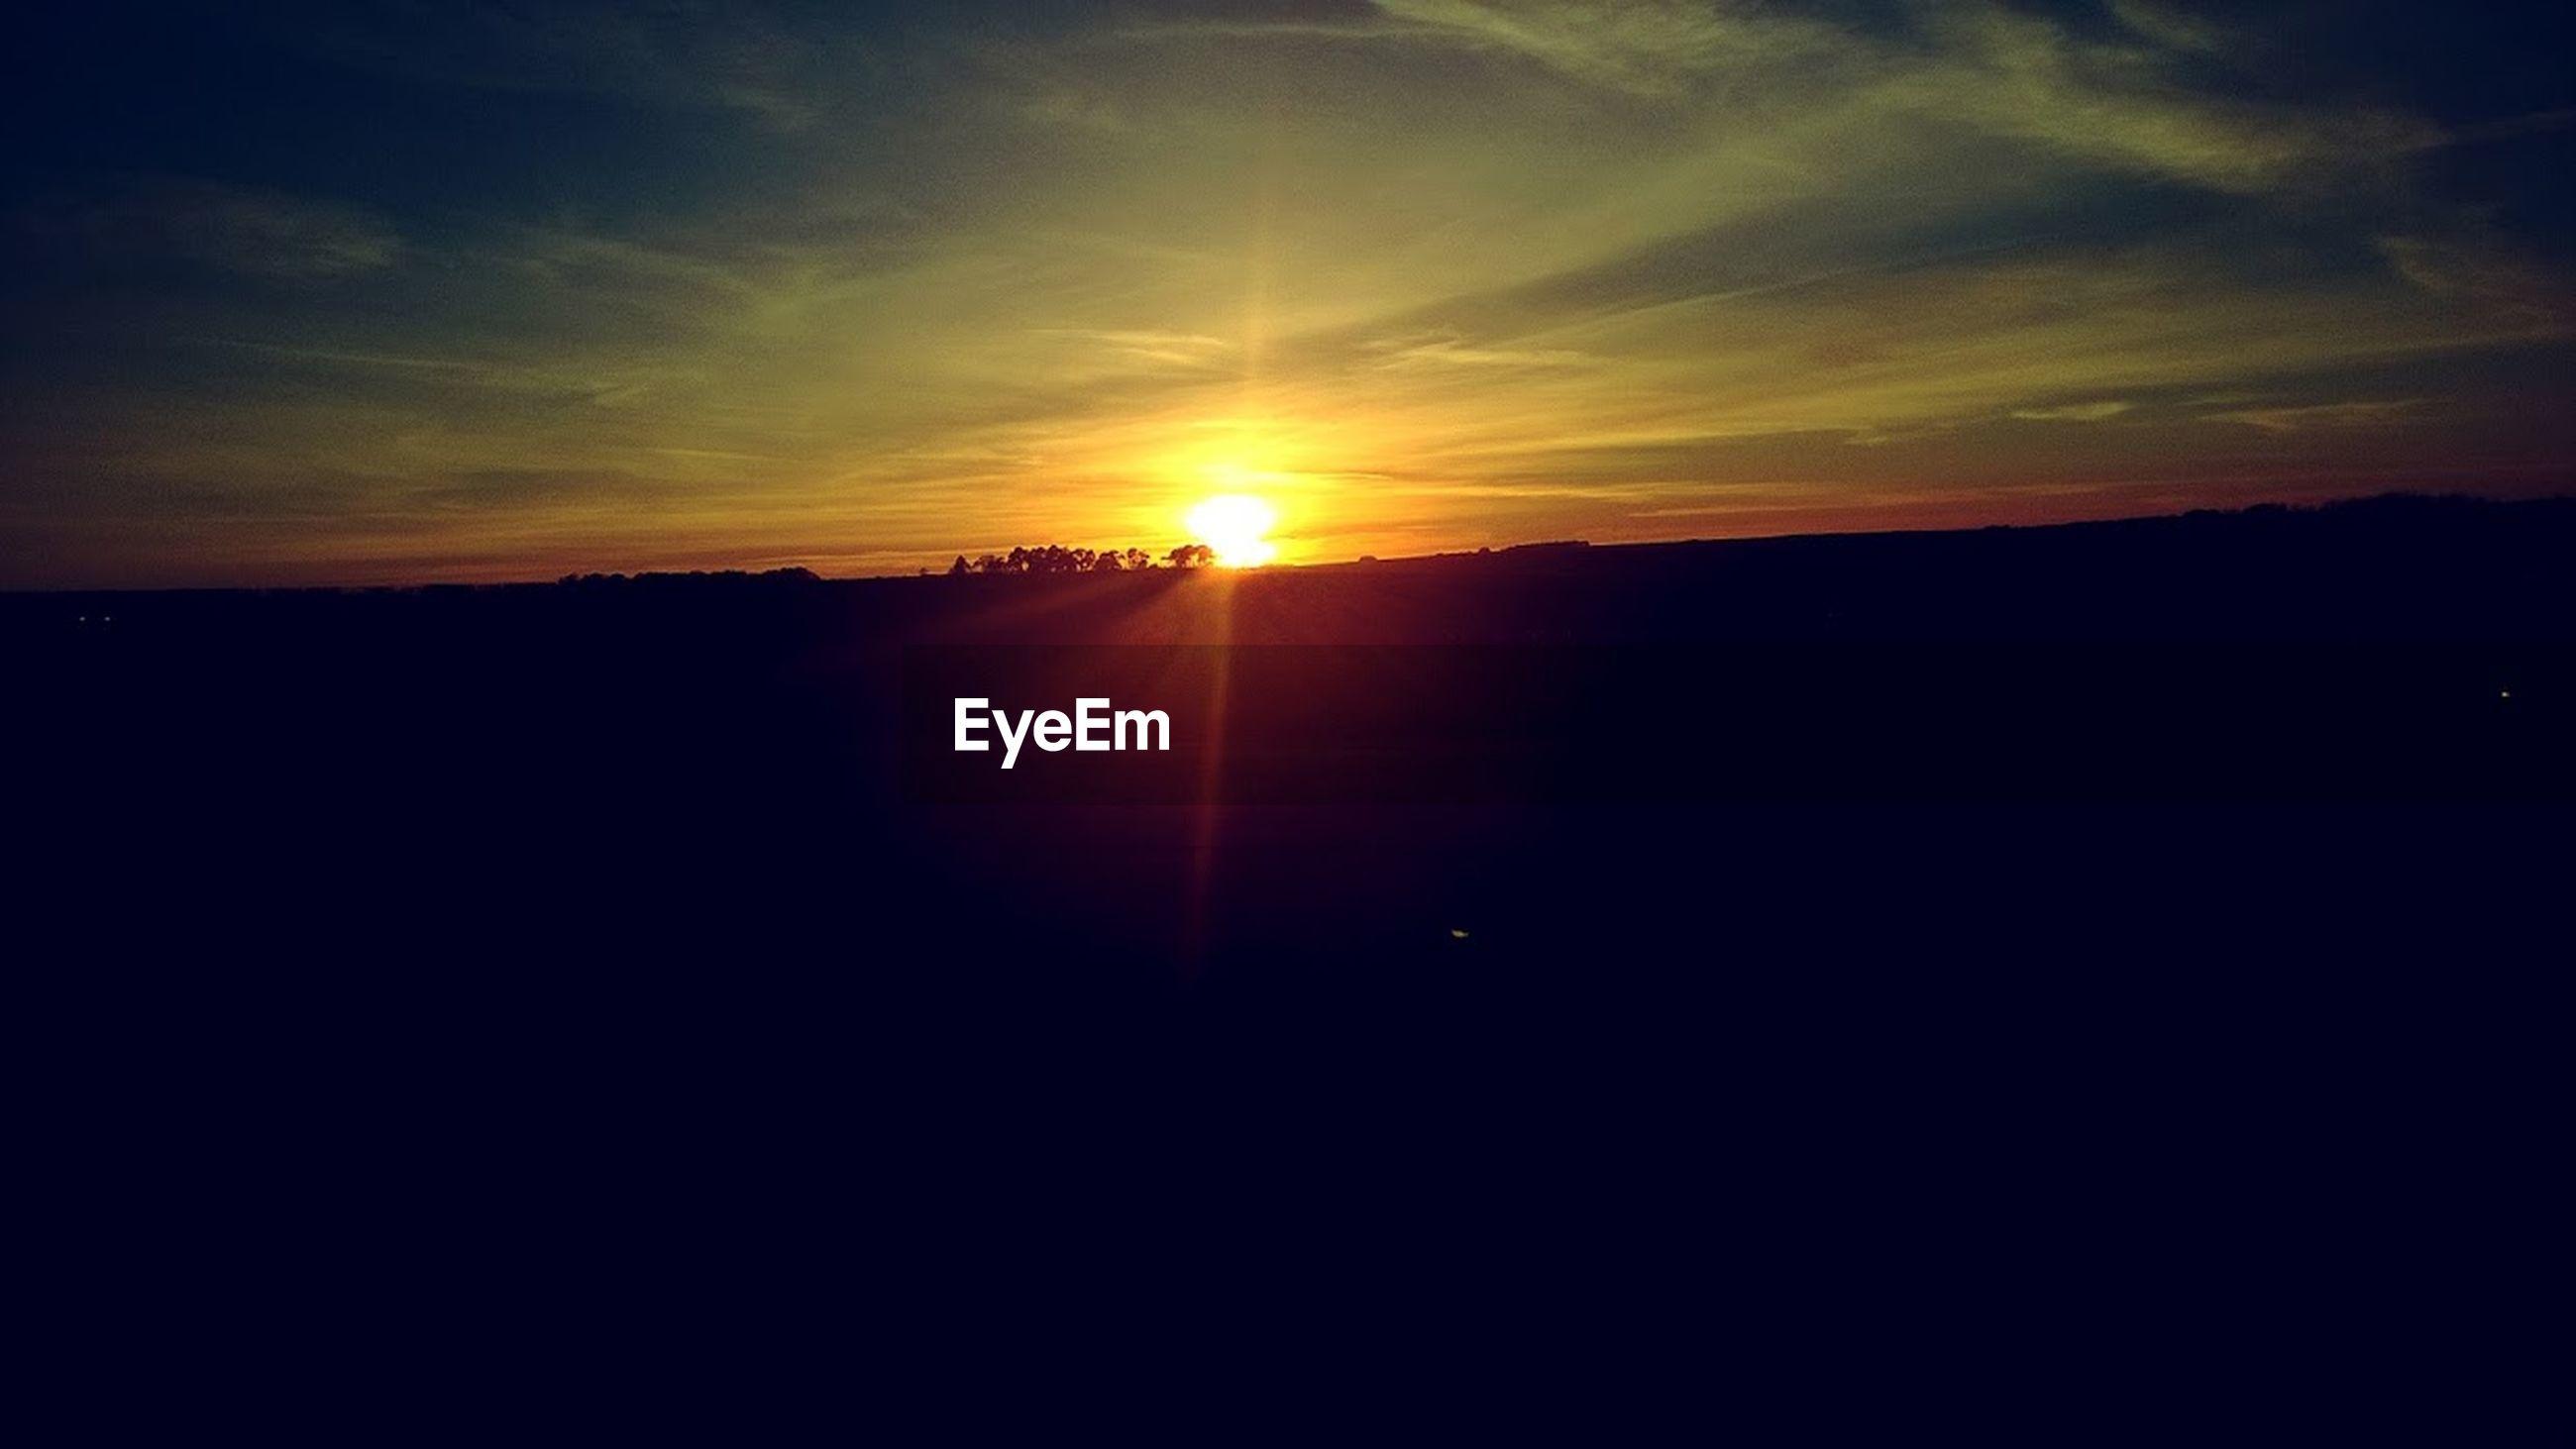 sky, sunset, sun, sunlight, beauty in nature, scenics - nature, tranquility, nature, cloud - sky, sunbeam, silhouette, orange color, environment, lens flare, tranquil scene, landscape, idyllic, no people, outdoors, horizon, dark, bright